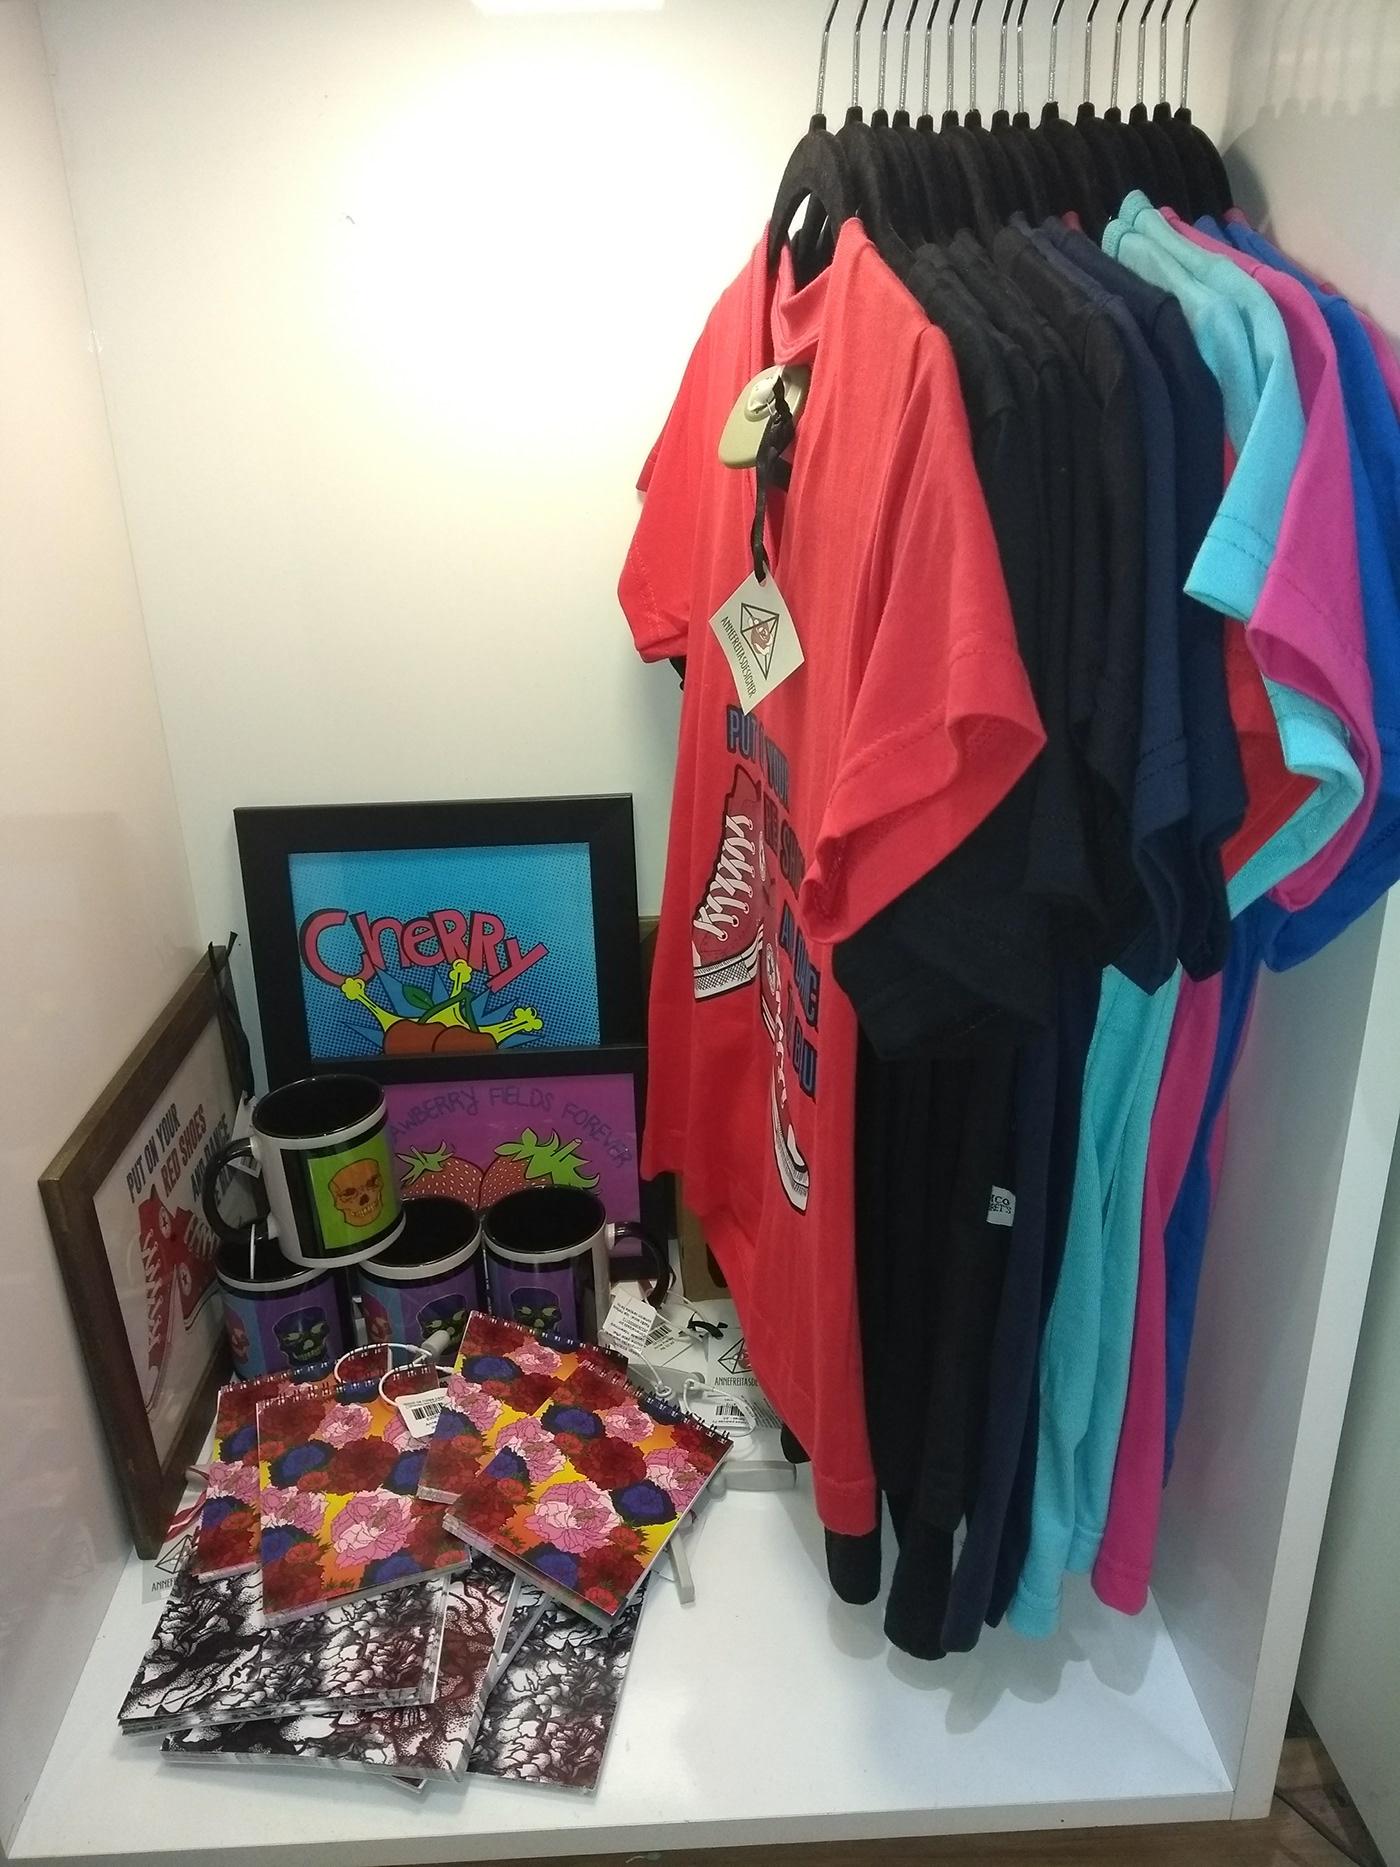 Image may contain: wall and clothing